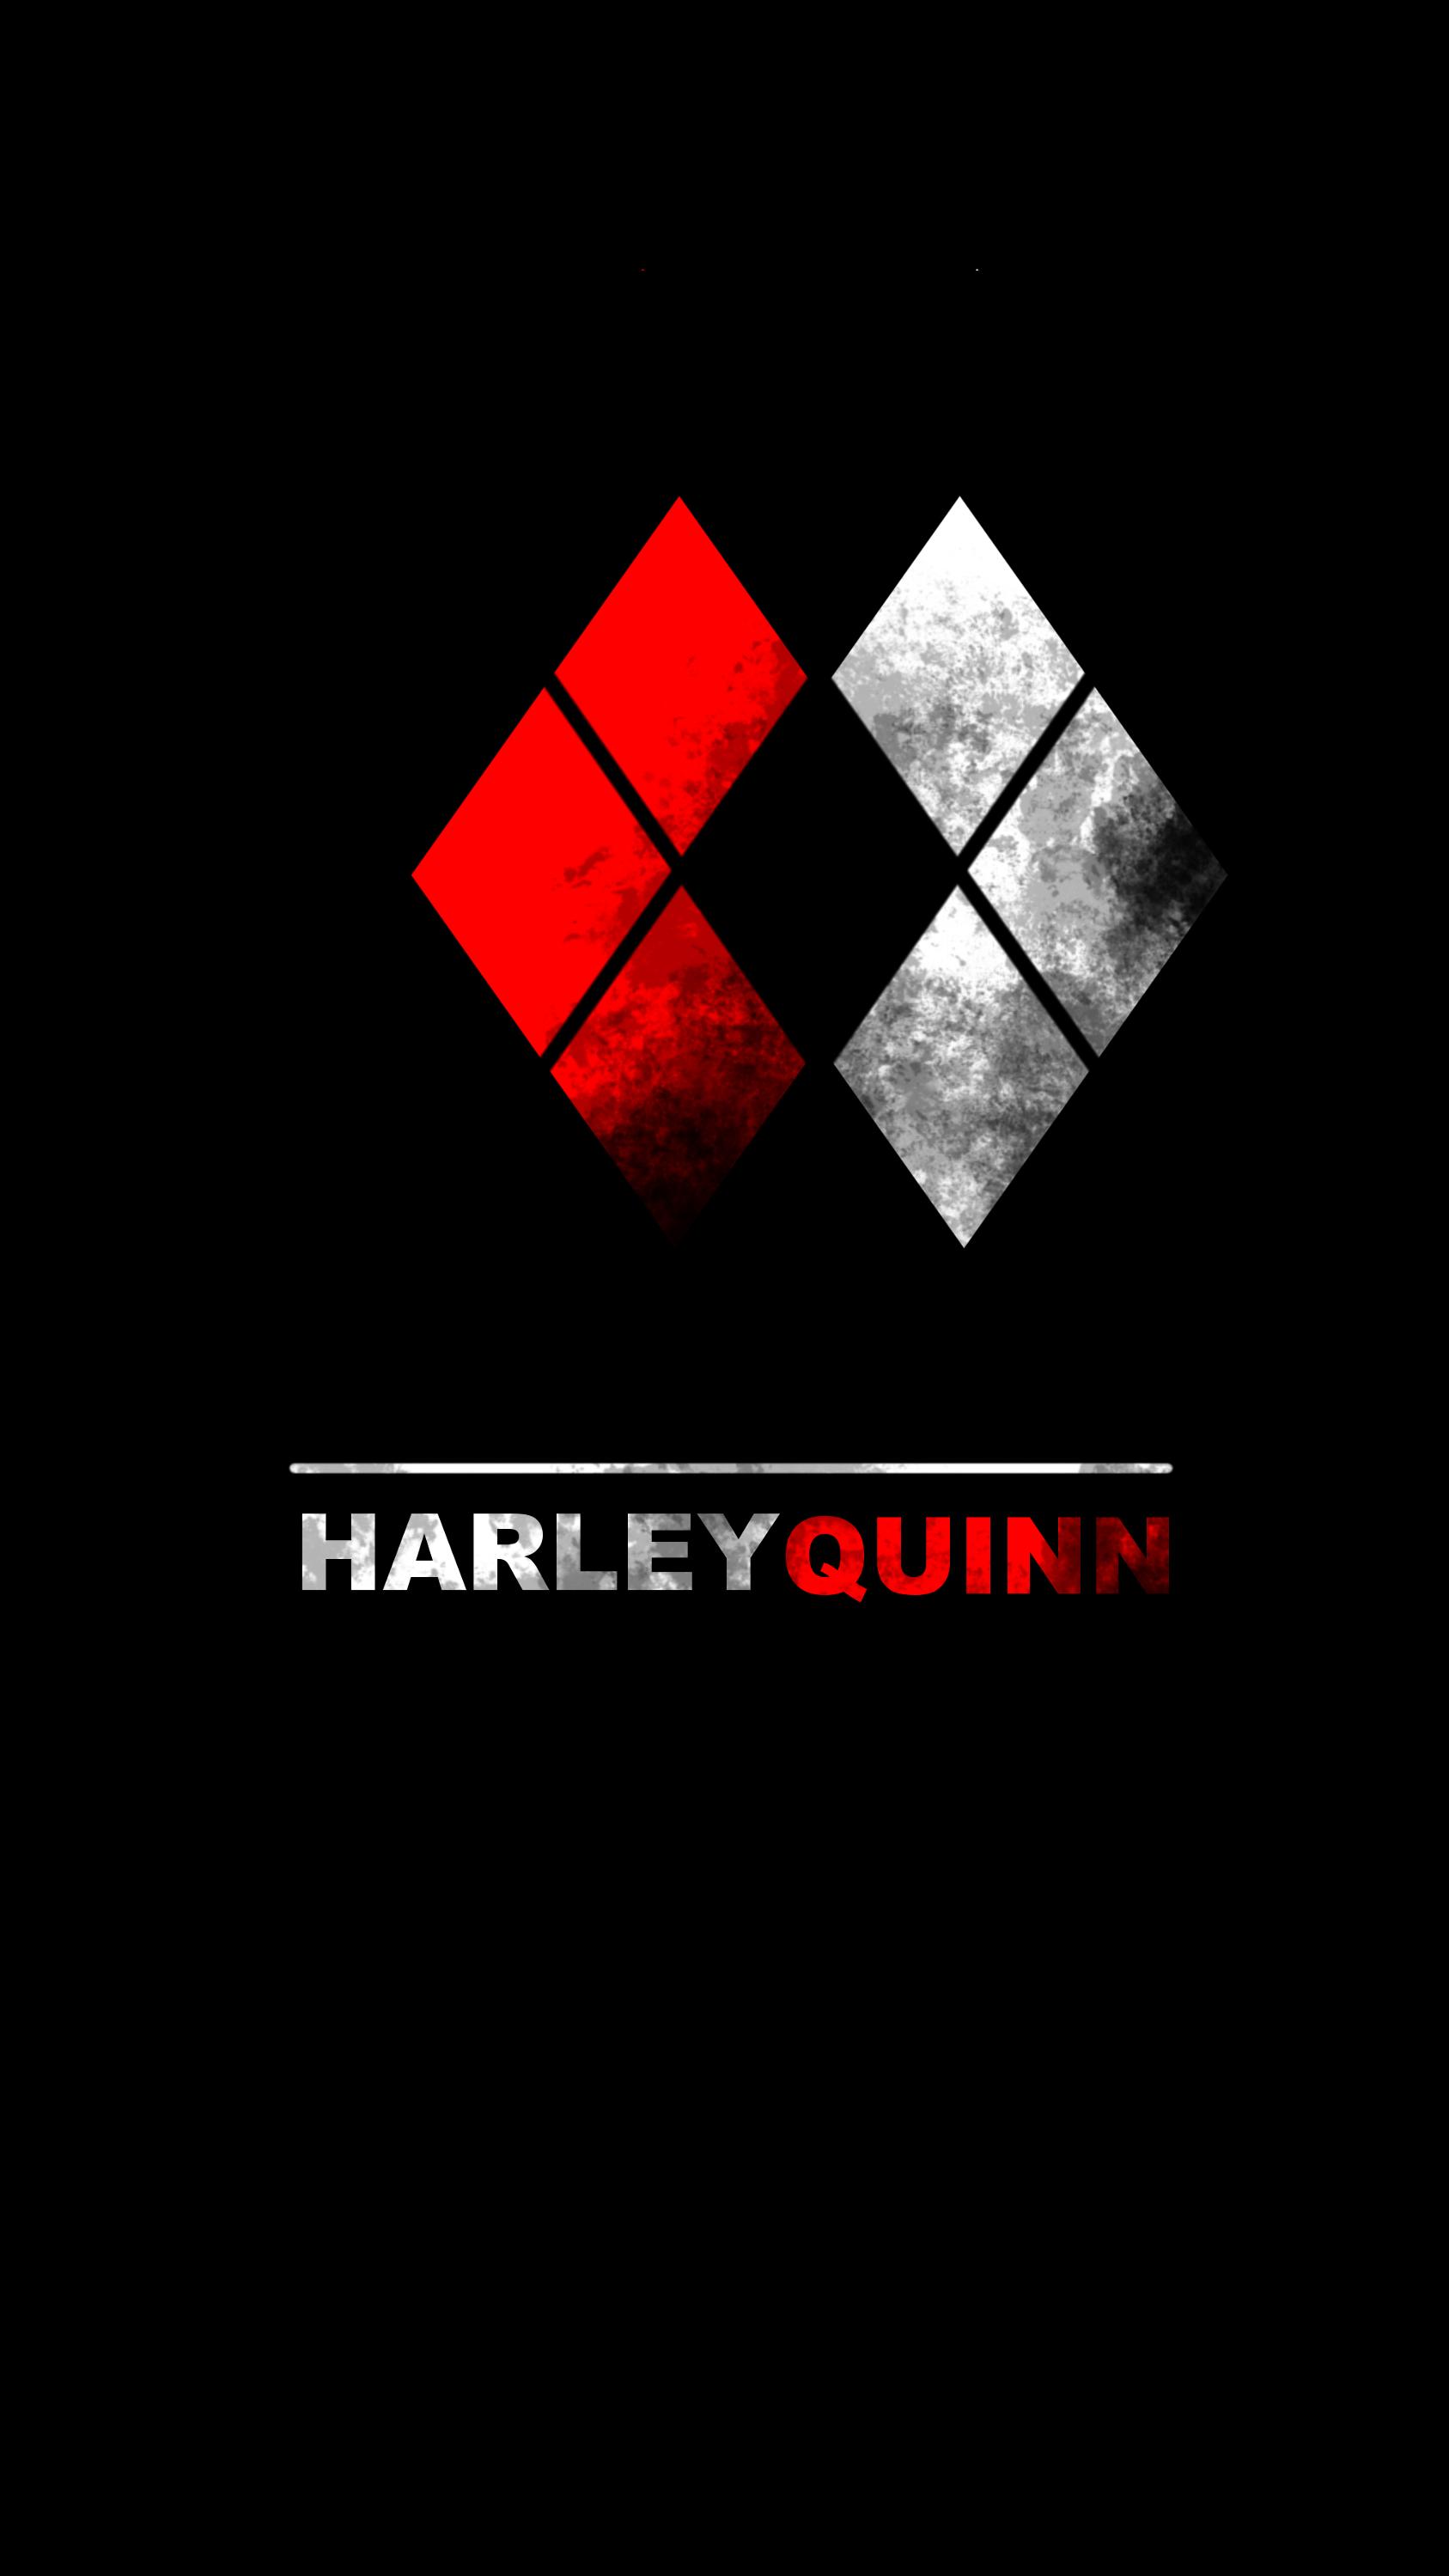 Harley Quinn Iphone 6 Wallpaper by KairoFall 1687x2999